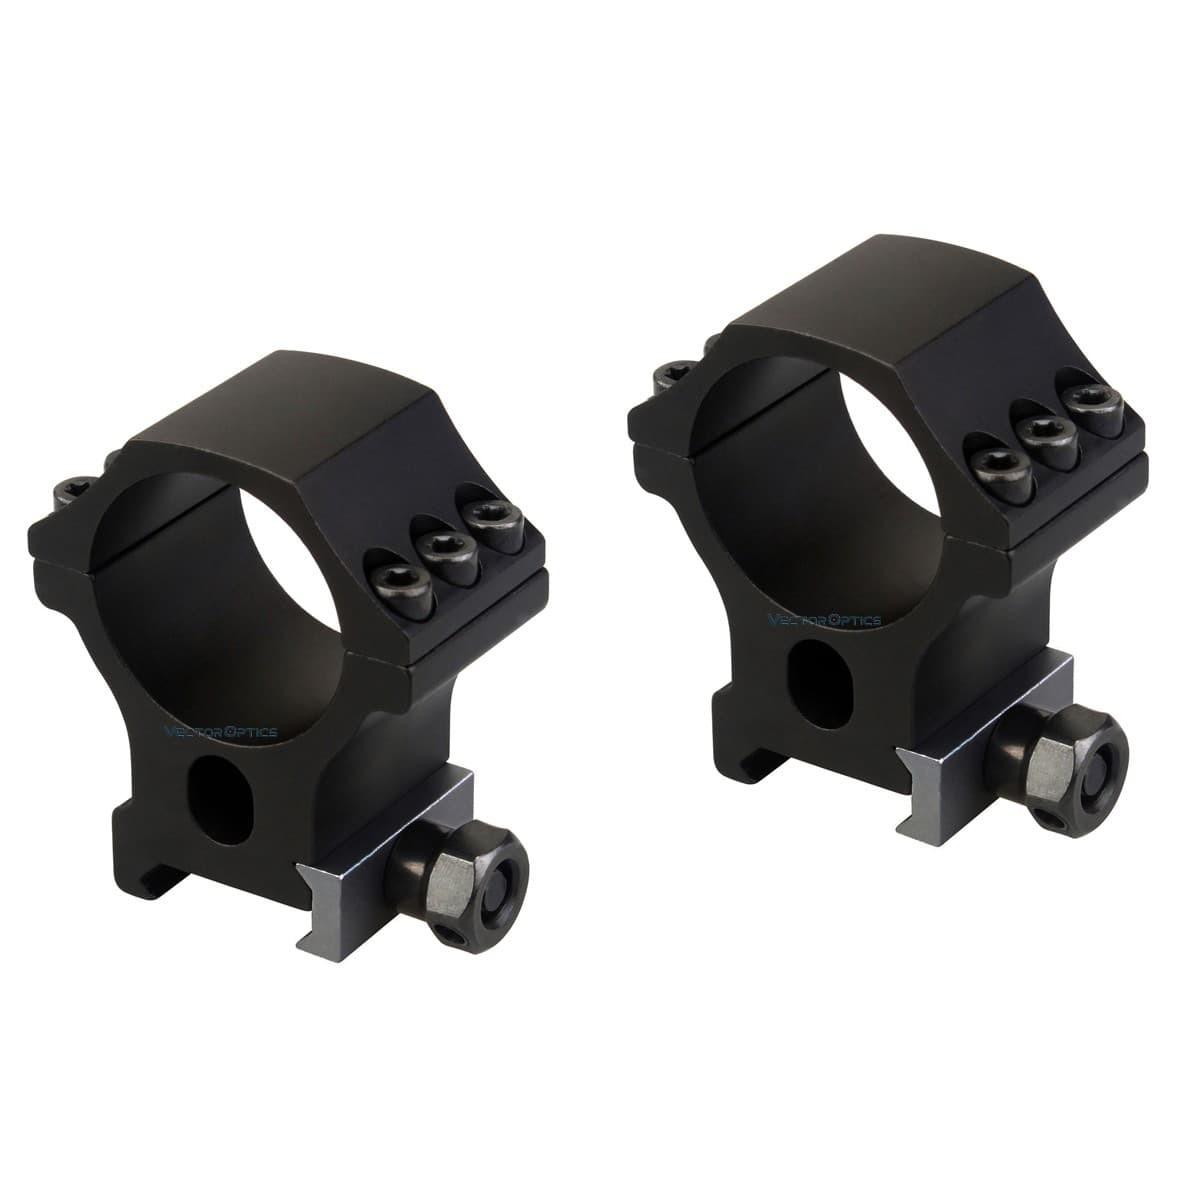 Continental 2-12x50SFP Riflescope